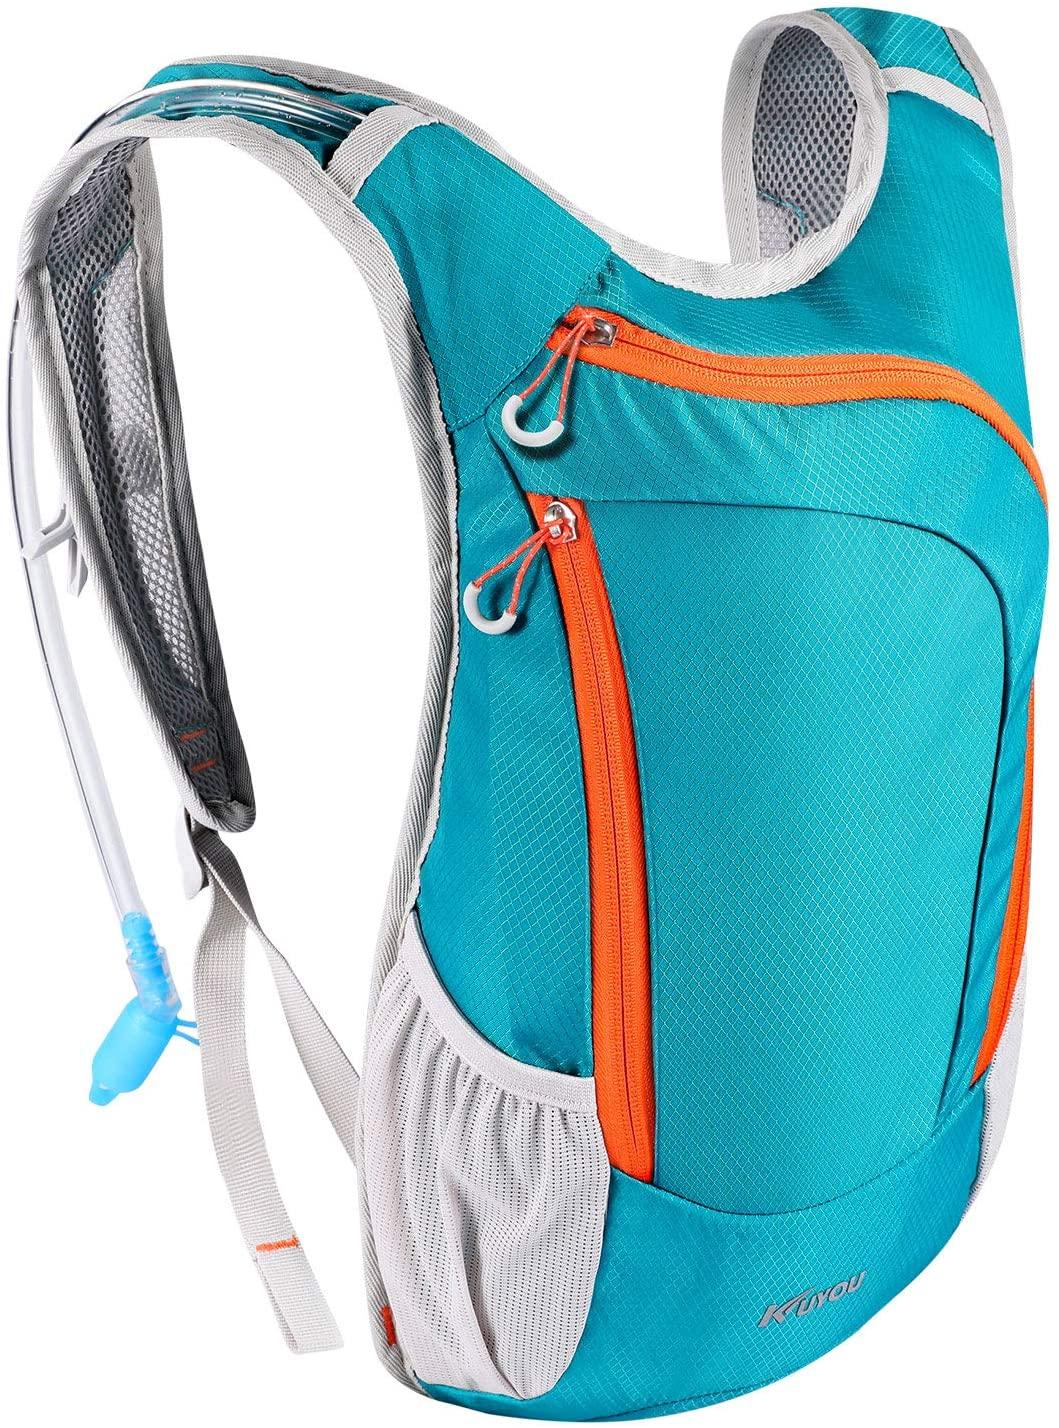 Save 40% on KUYOU Hydration Pack,Hydration Backpack